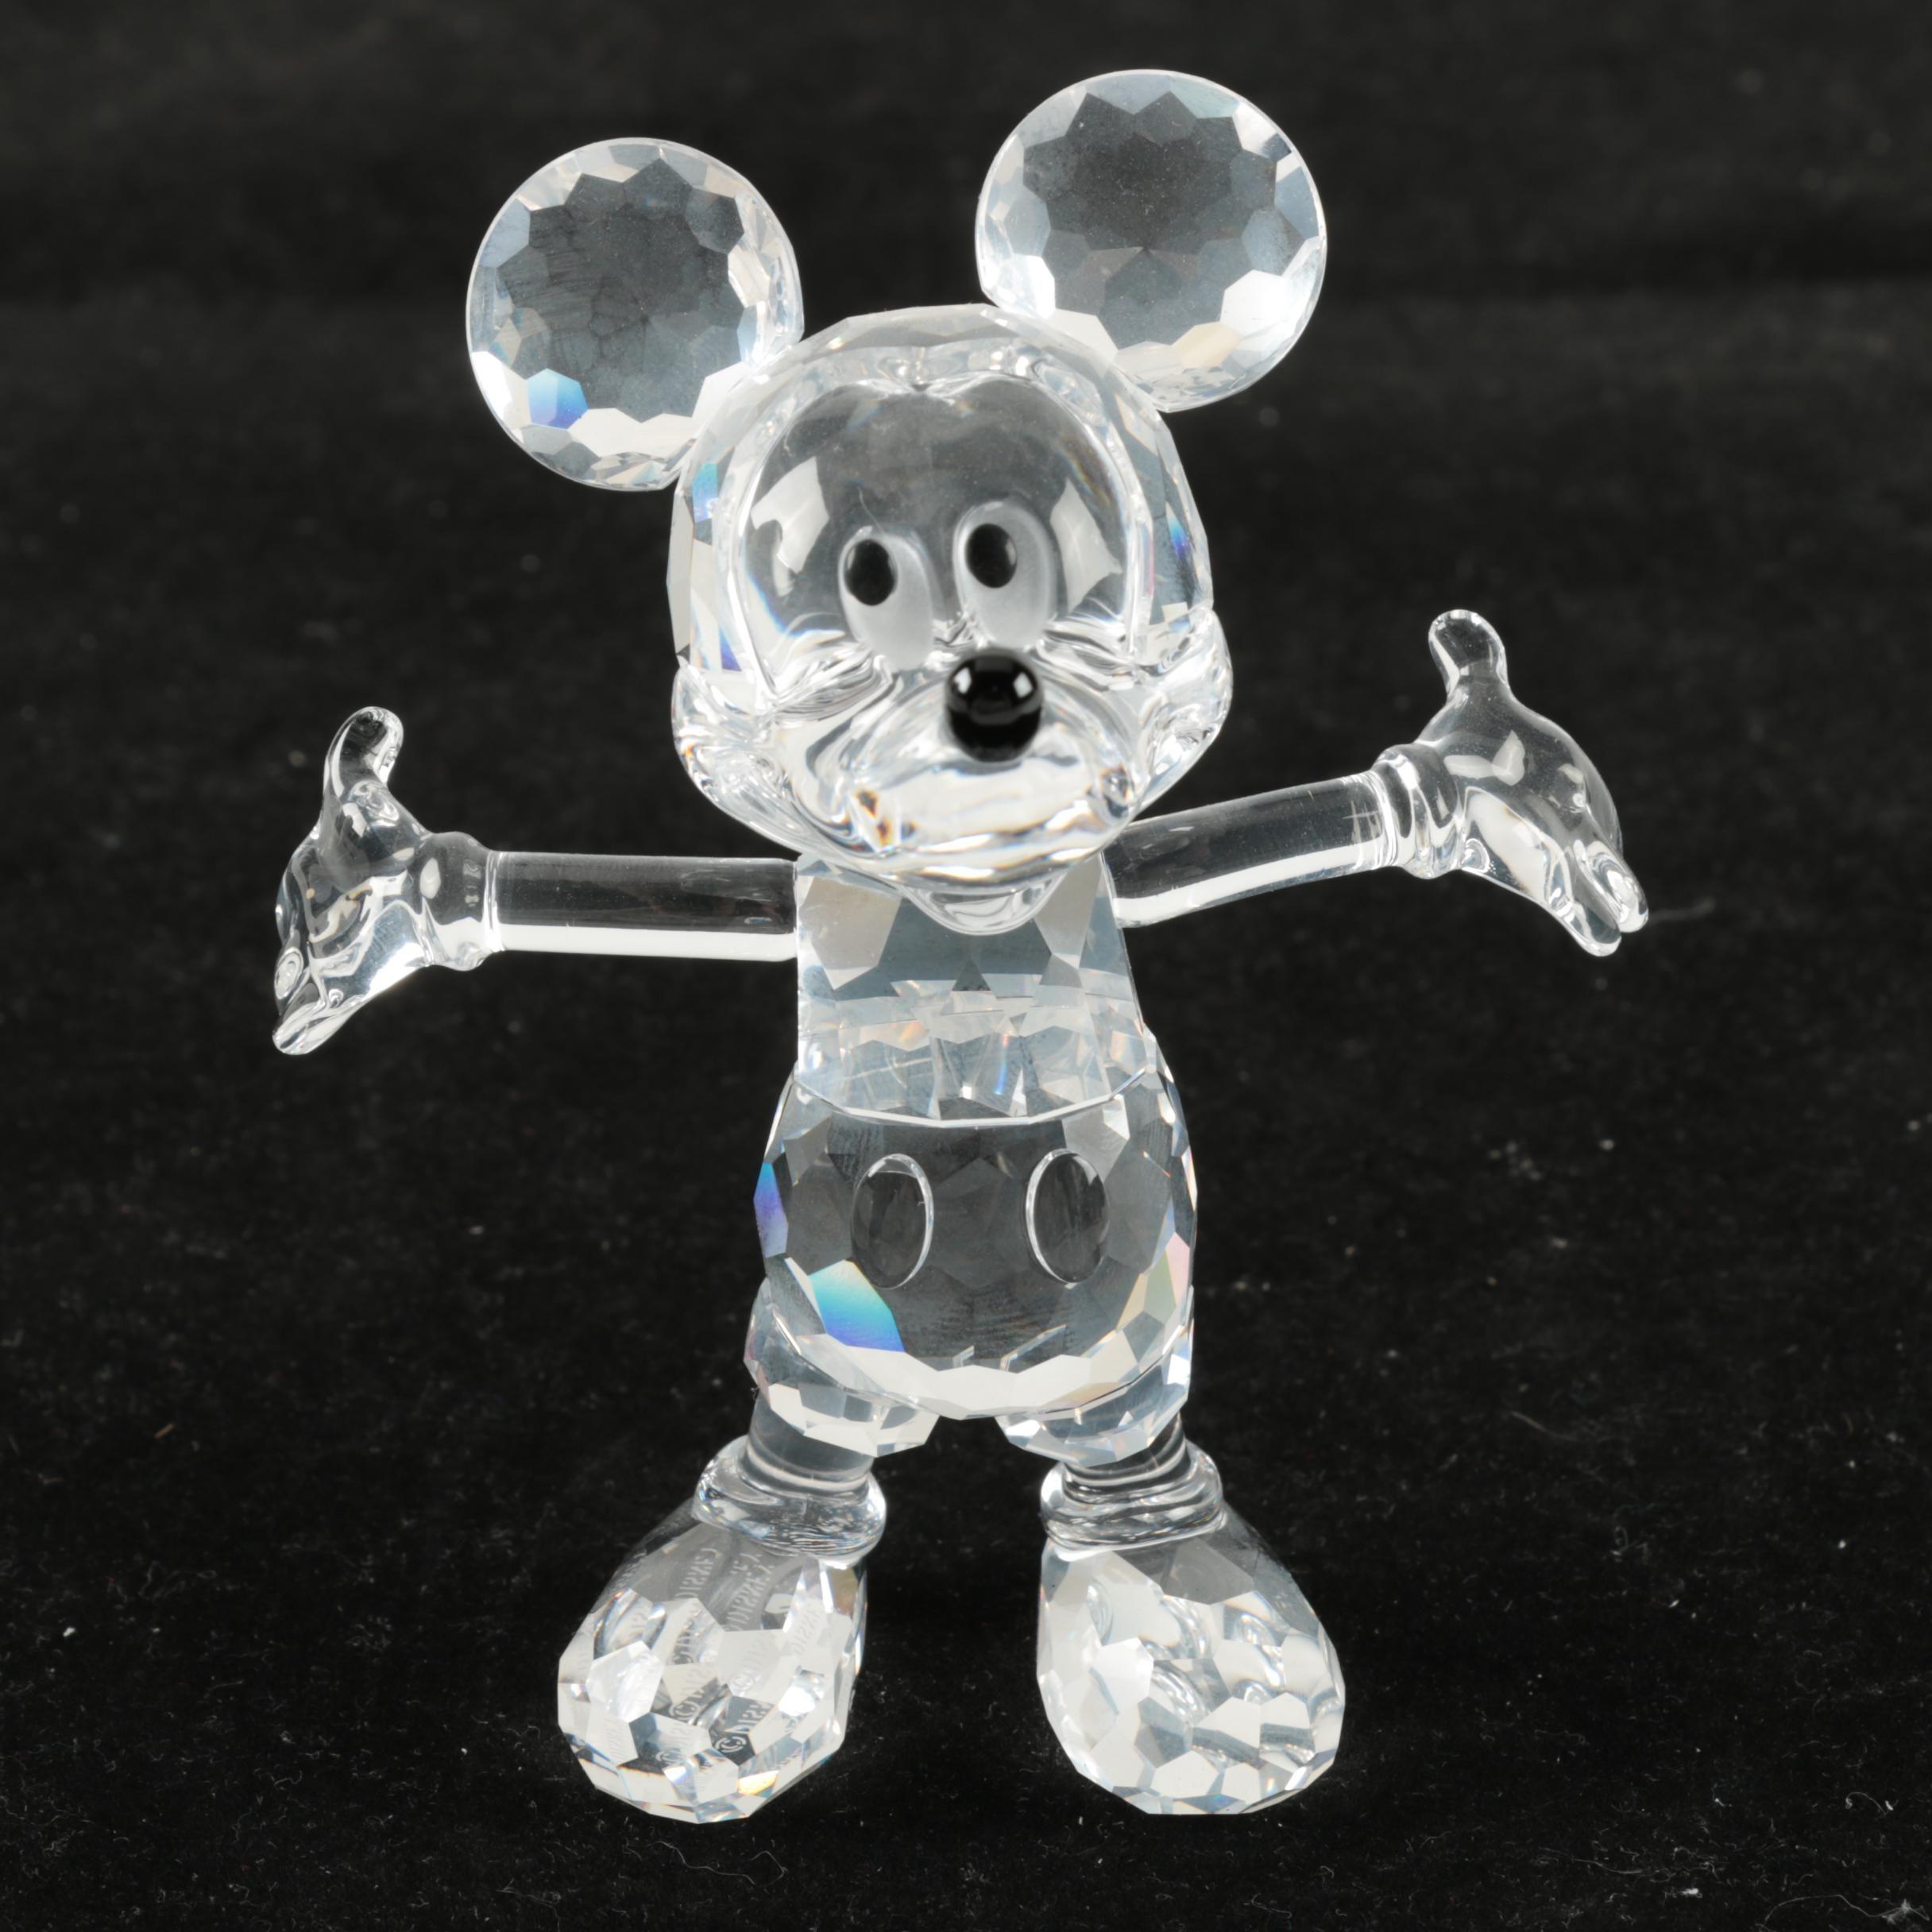 Swarovski Crystal Mickey Mouse Figurine